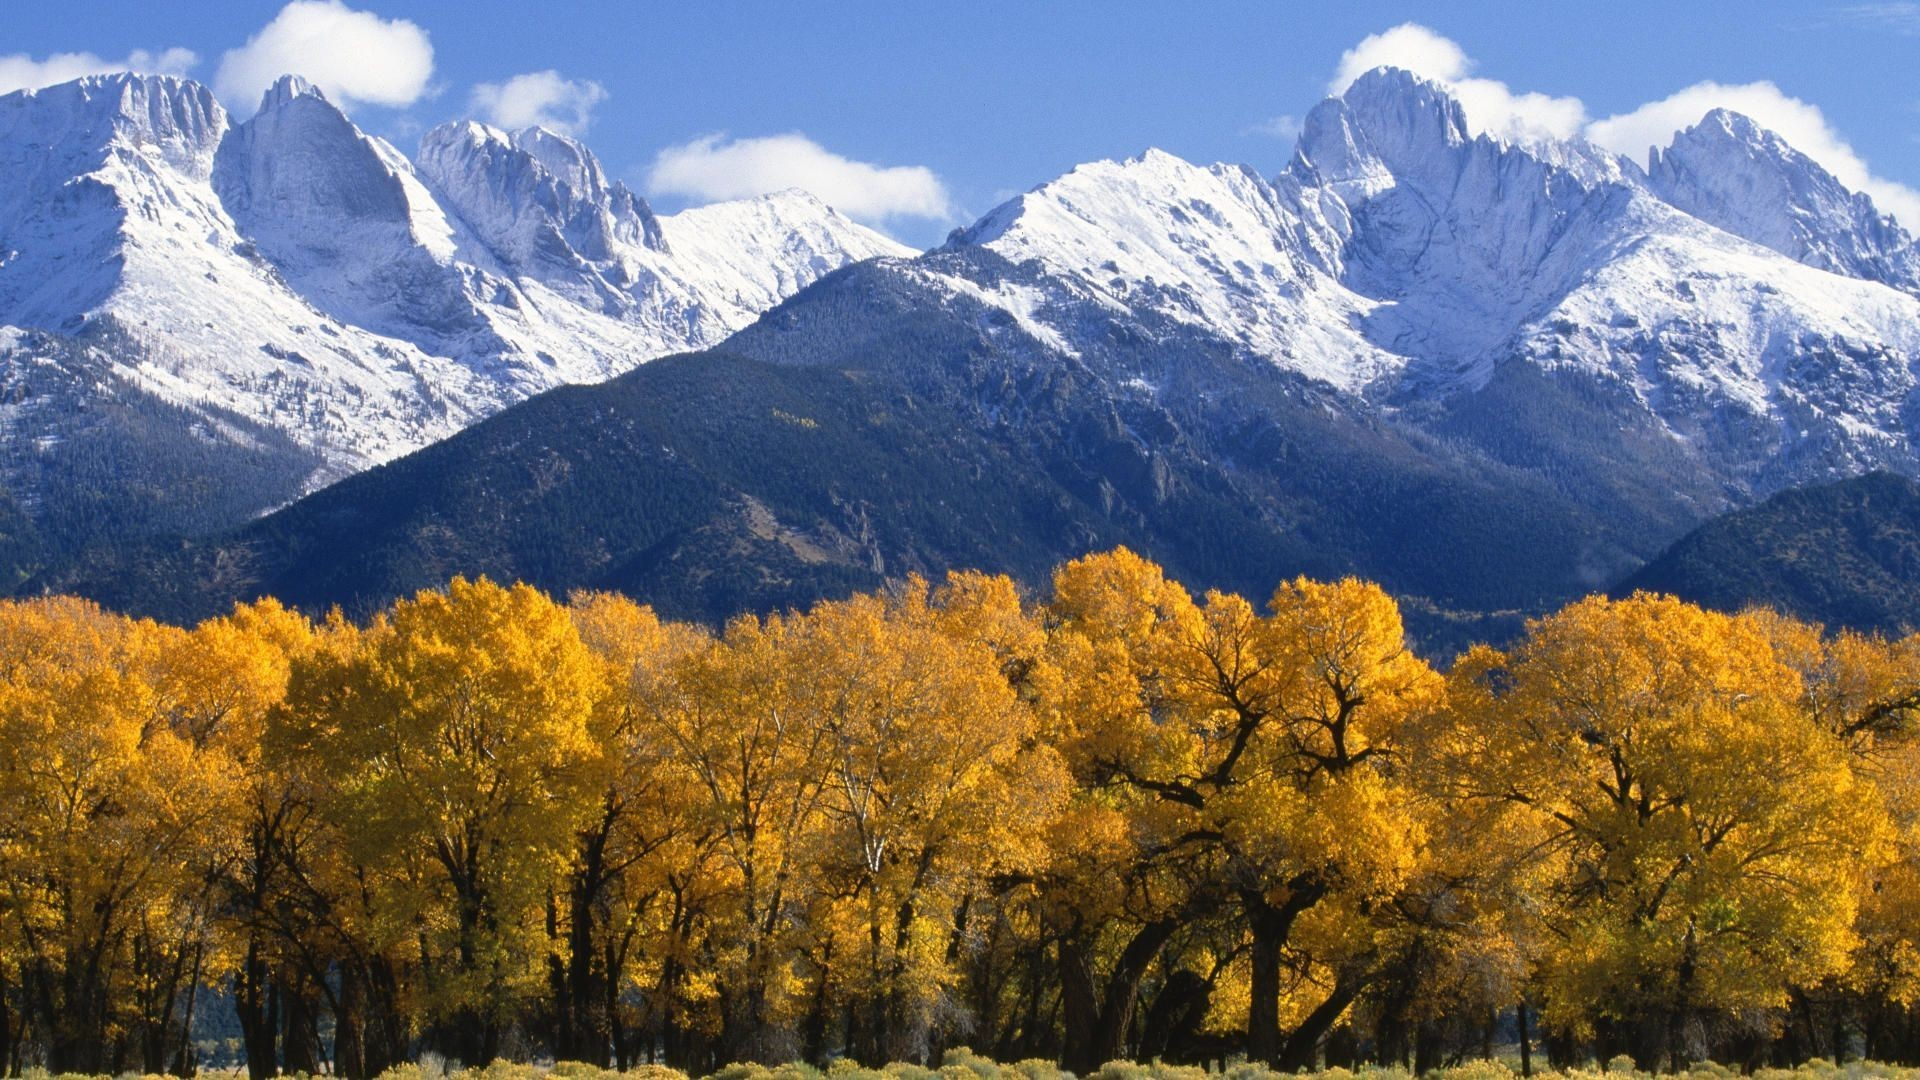 Colorado Fall Scenery – wallpaper.